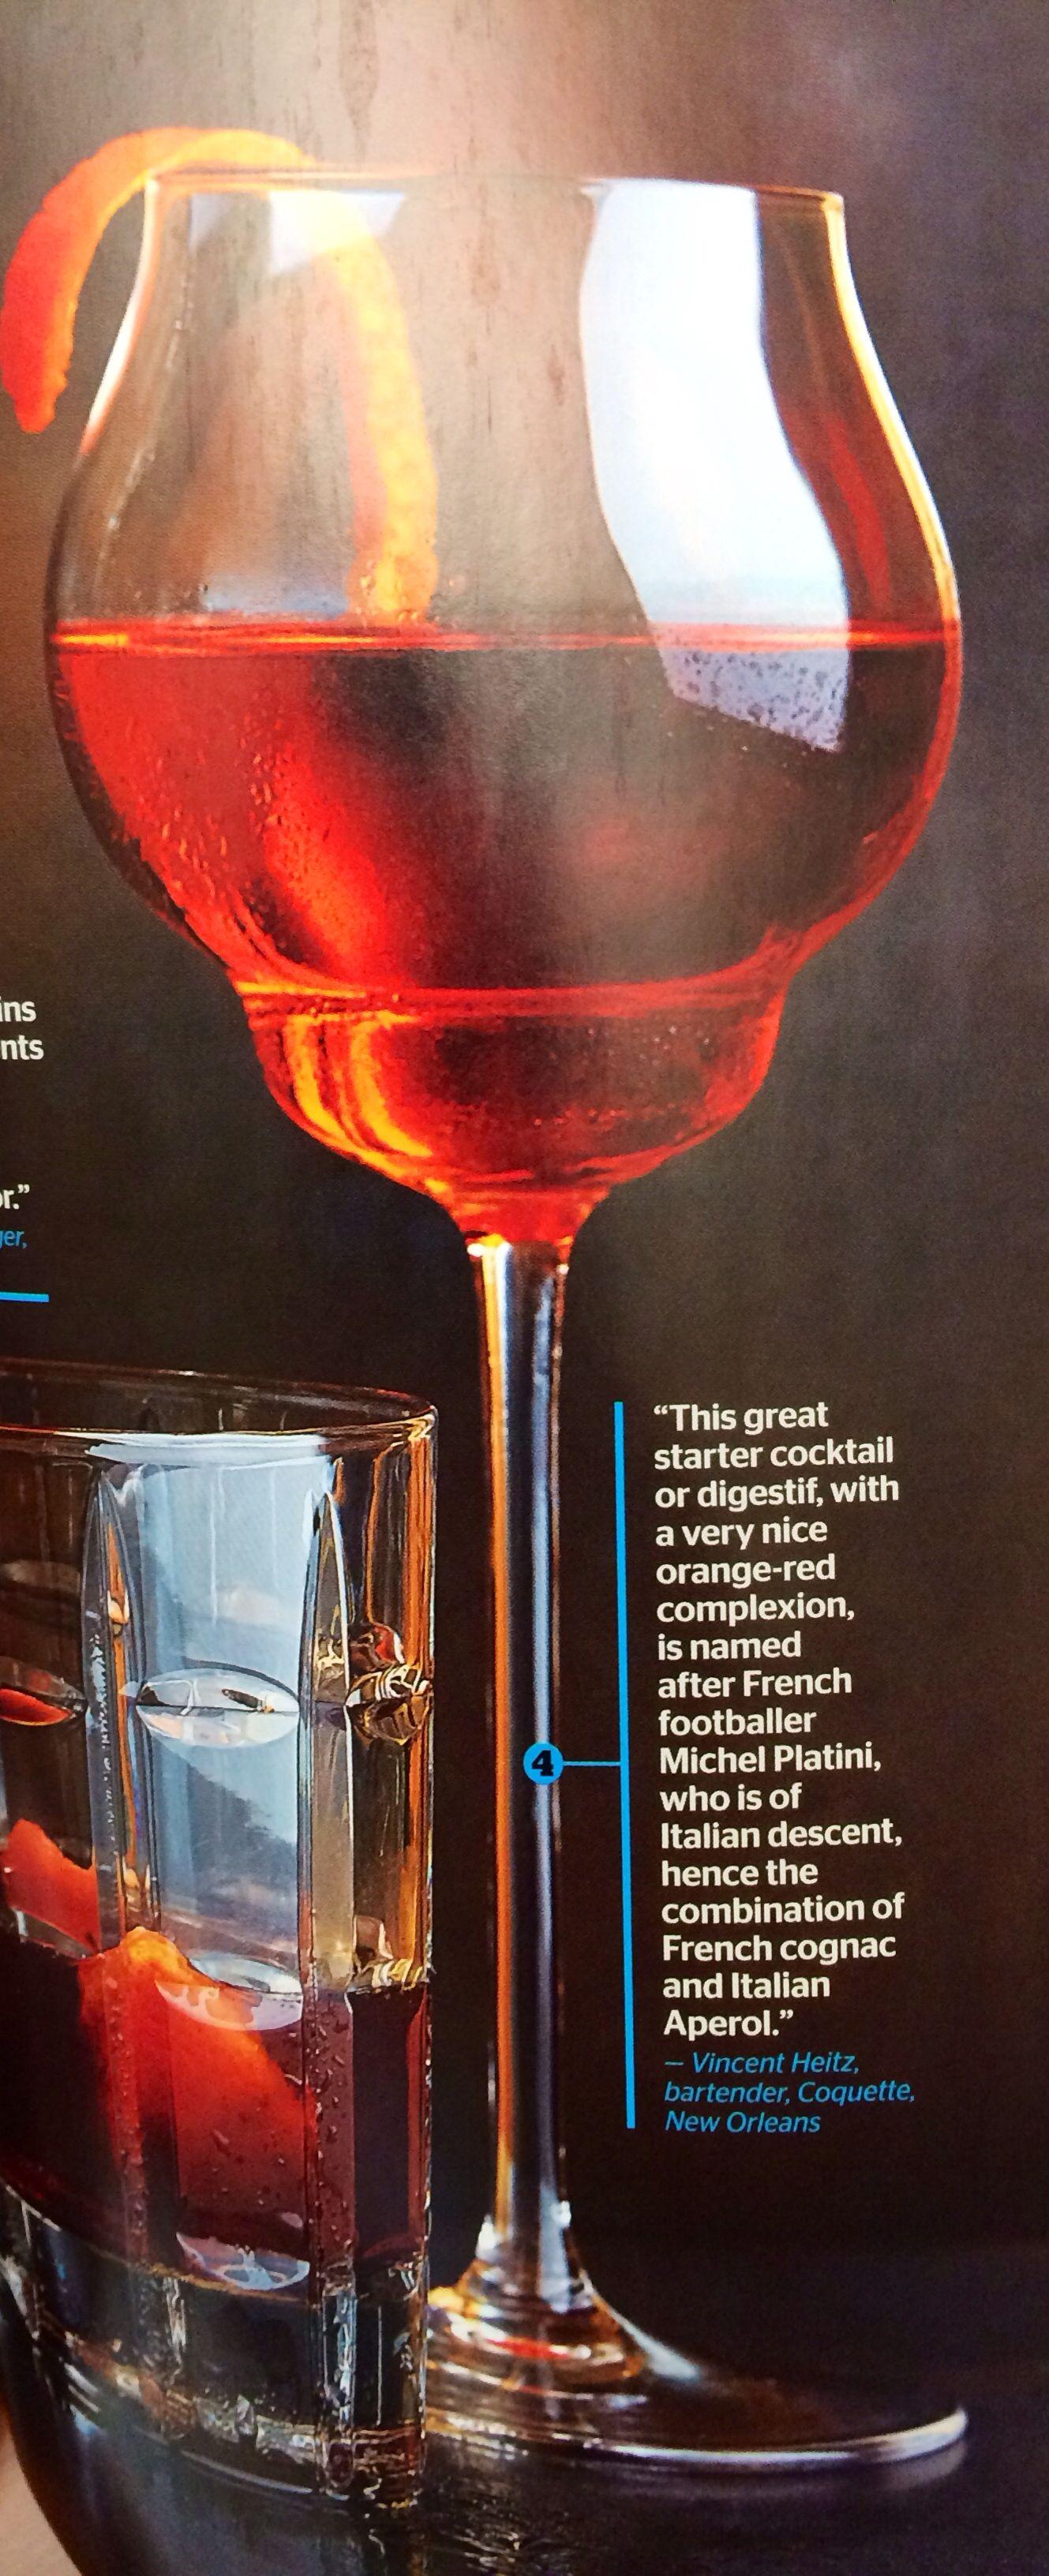 The Platini Elegant And Strong 1 1 2 Ozs Cognac 3 4 Ozs Cocchi Americano 3 4 Ozs Aperol Orange Peel Stir All Ingredi Aperol Mixing Glass Alcoholic Drinks